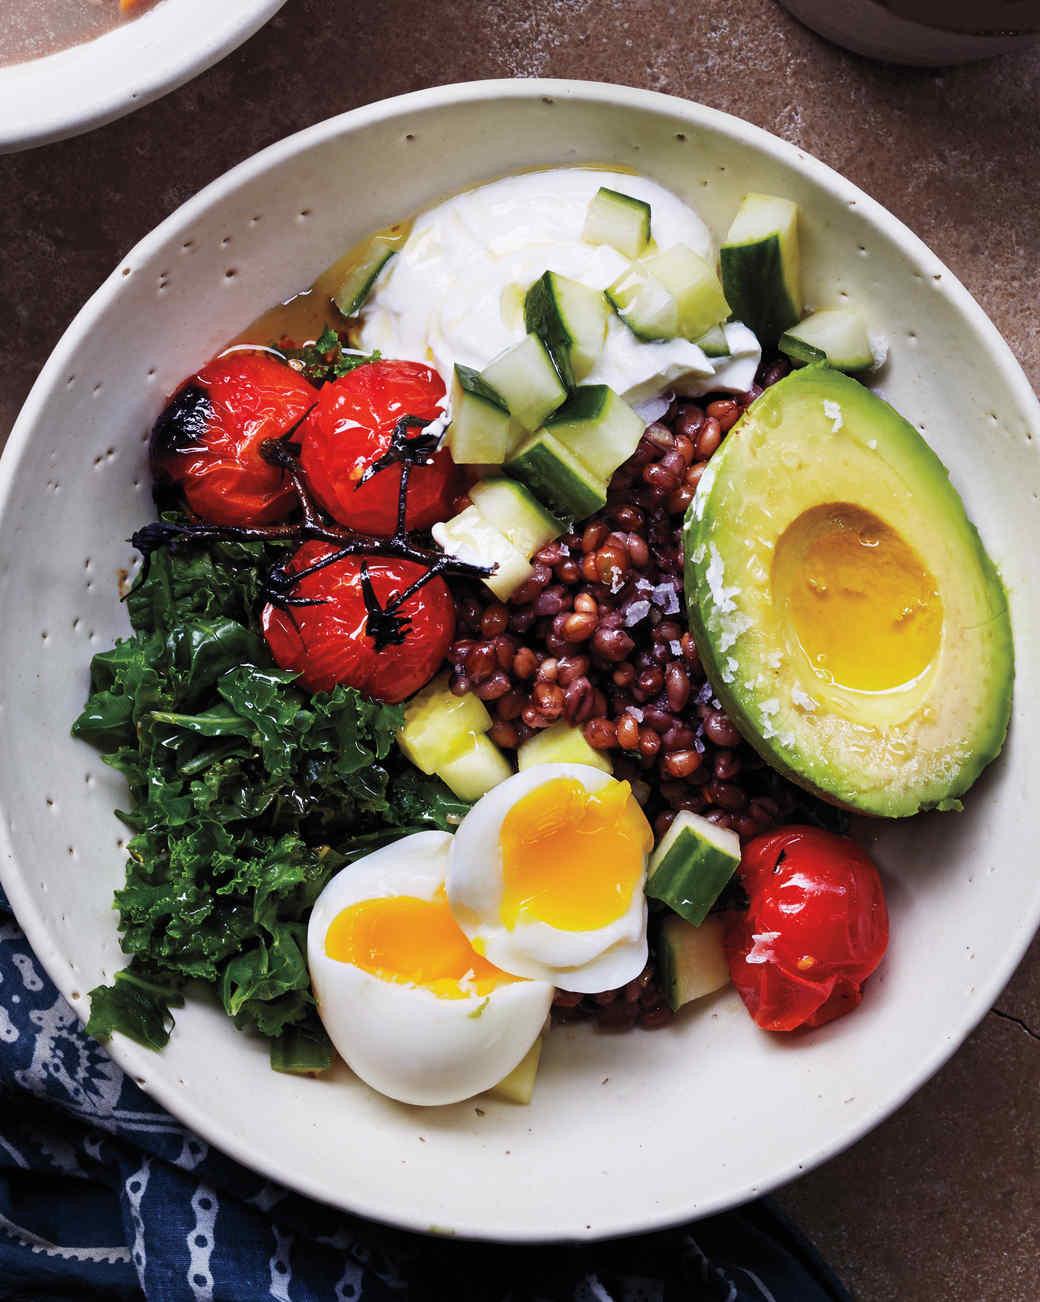 Healthy Savory Breakfast  Savory Breakfast Bowl